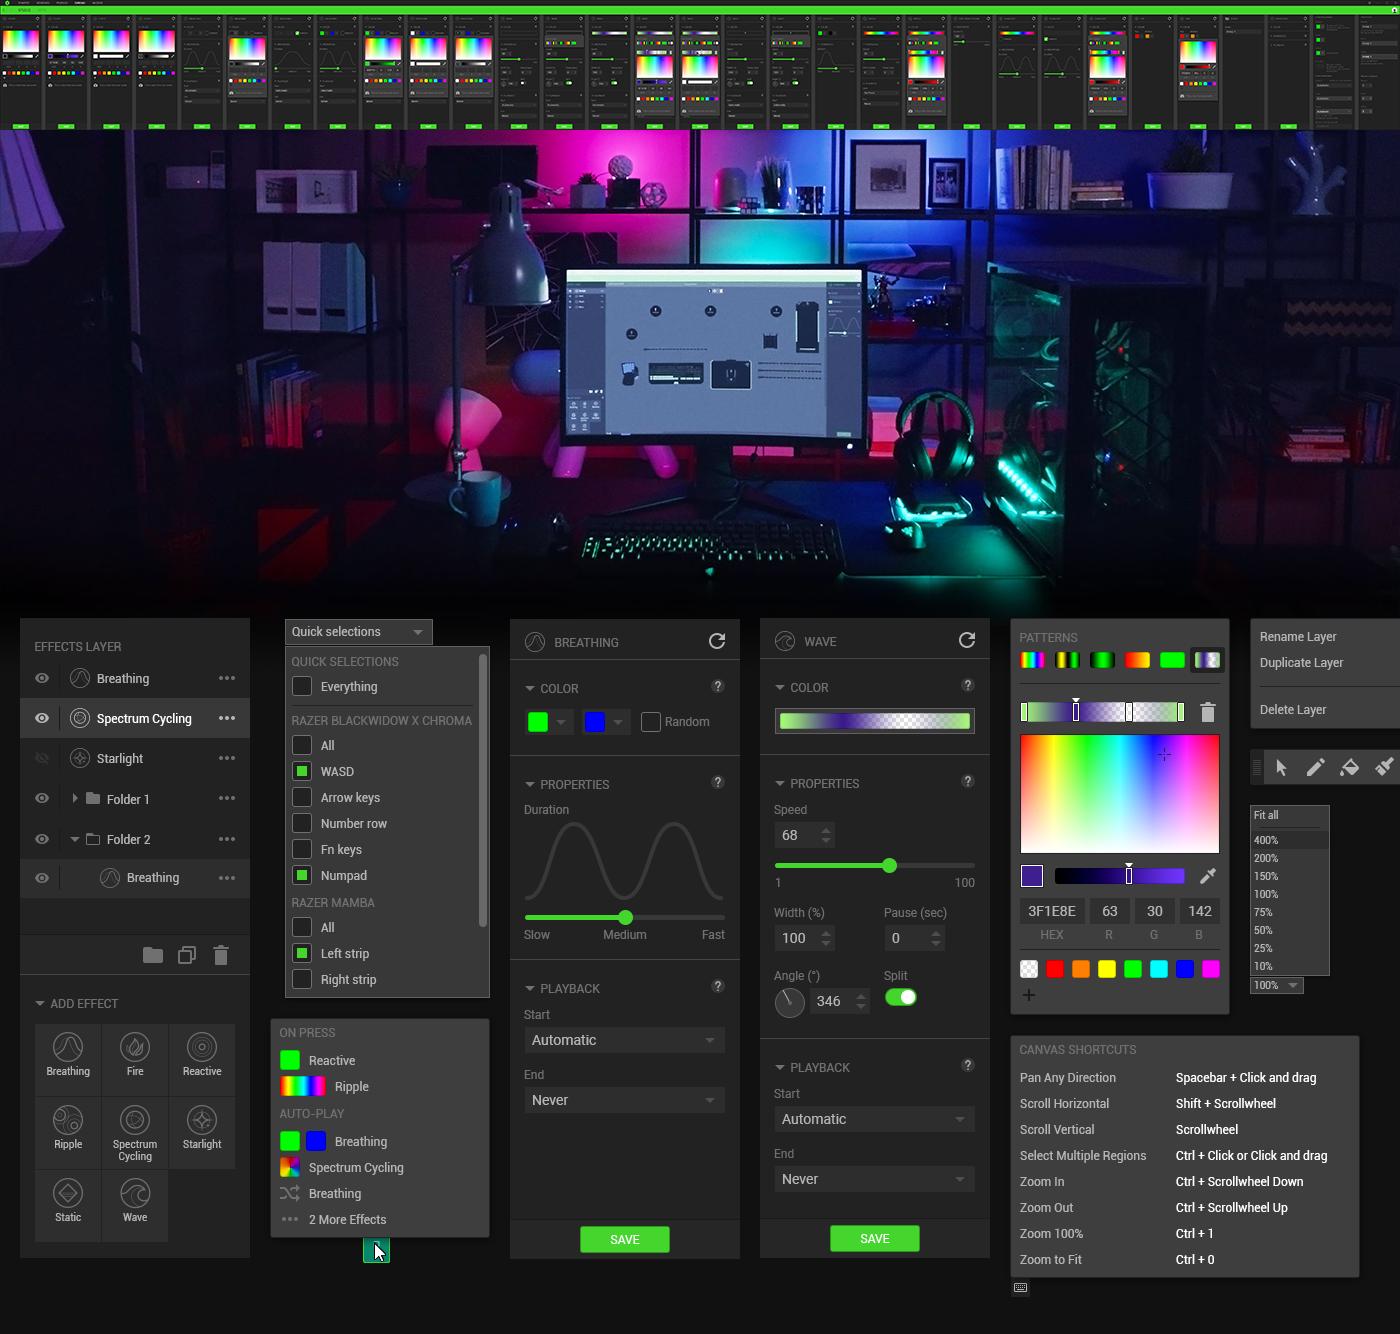 razer synapse peripherals software windows app chroma lighting